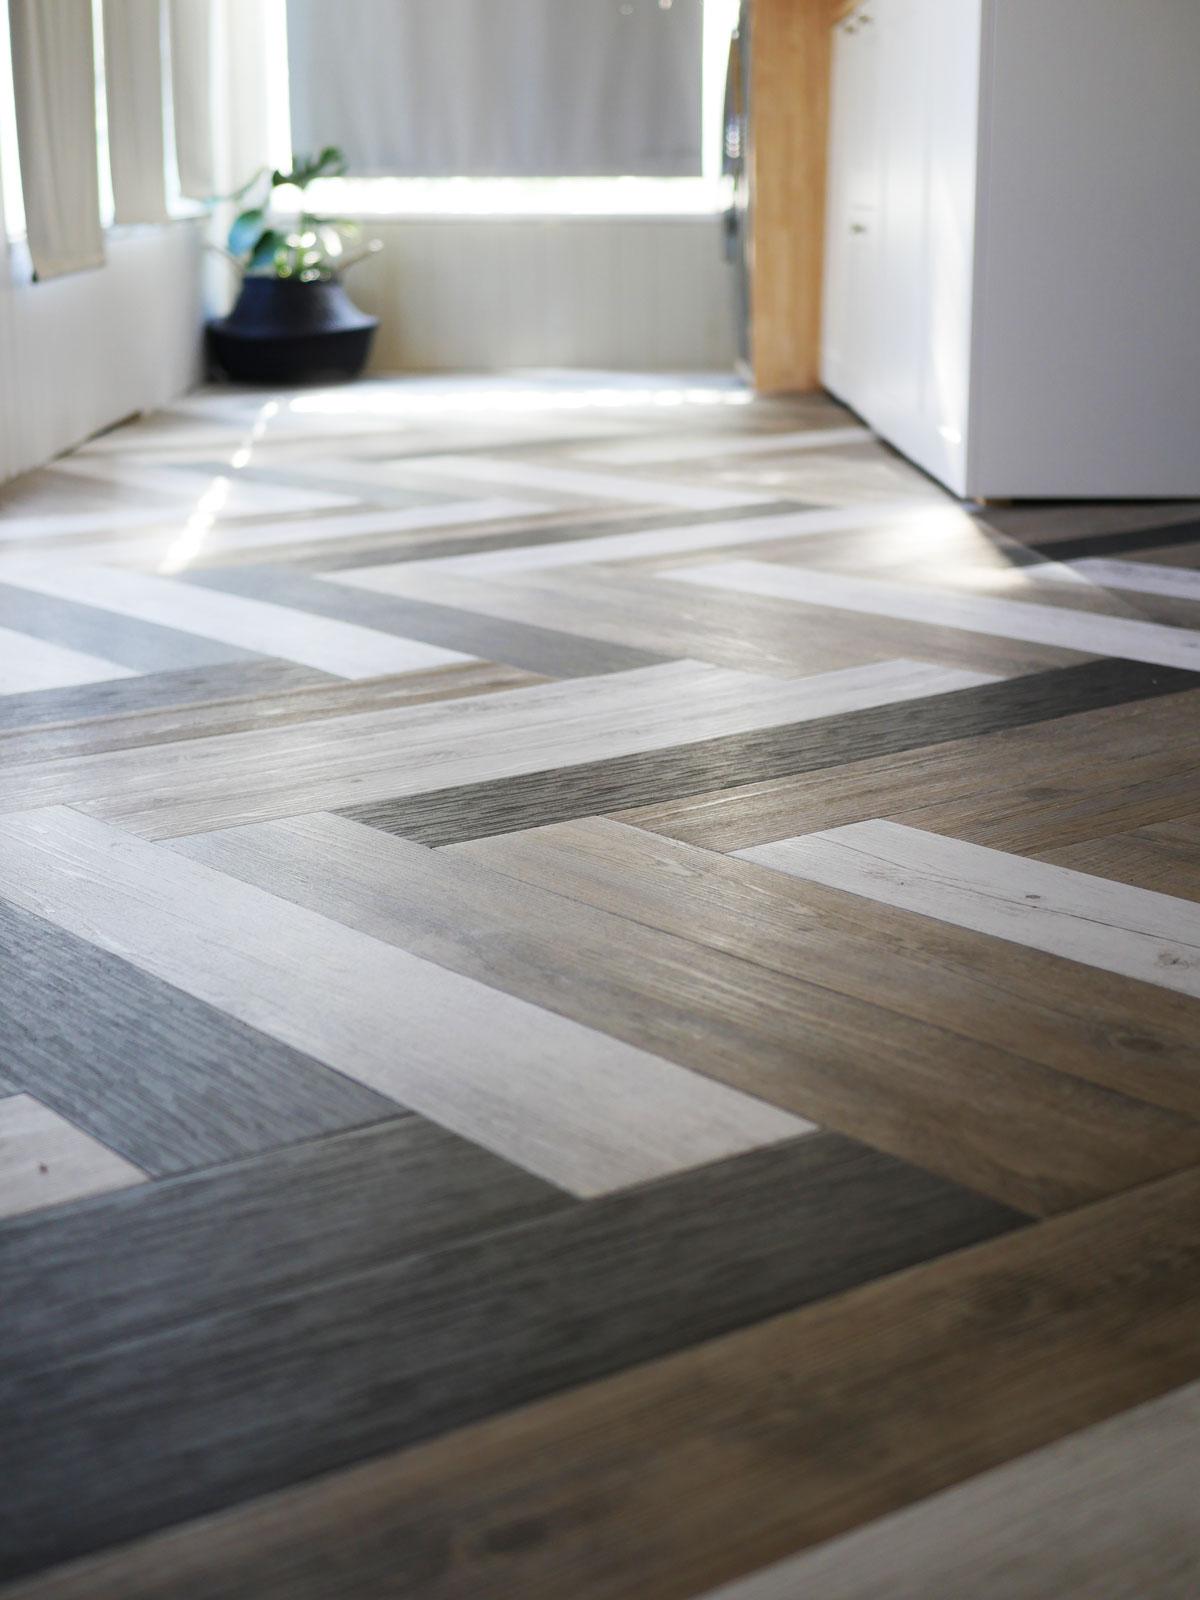 Herringbone Floors With Vinyl Stick Down Planks.